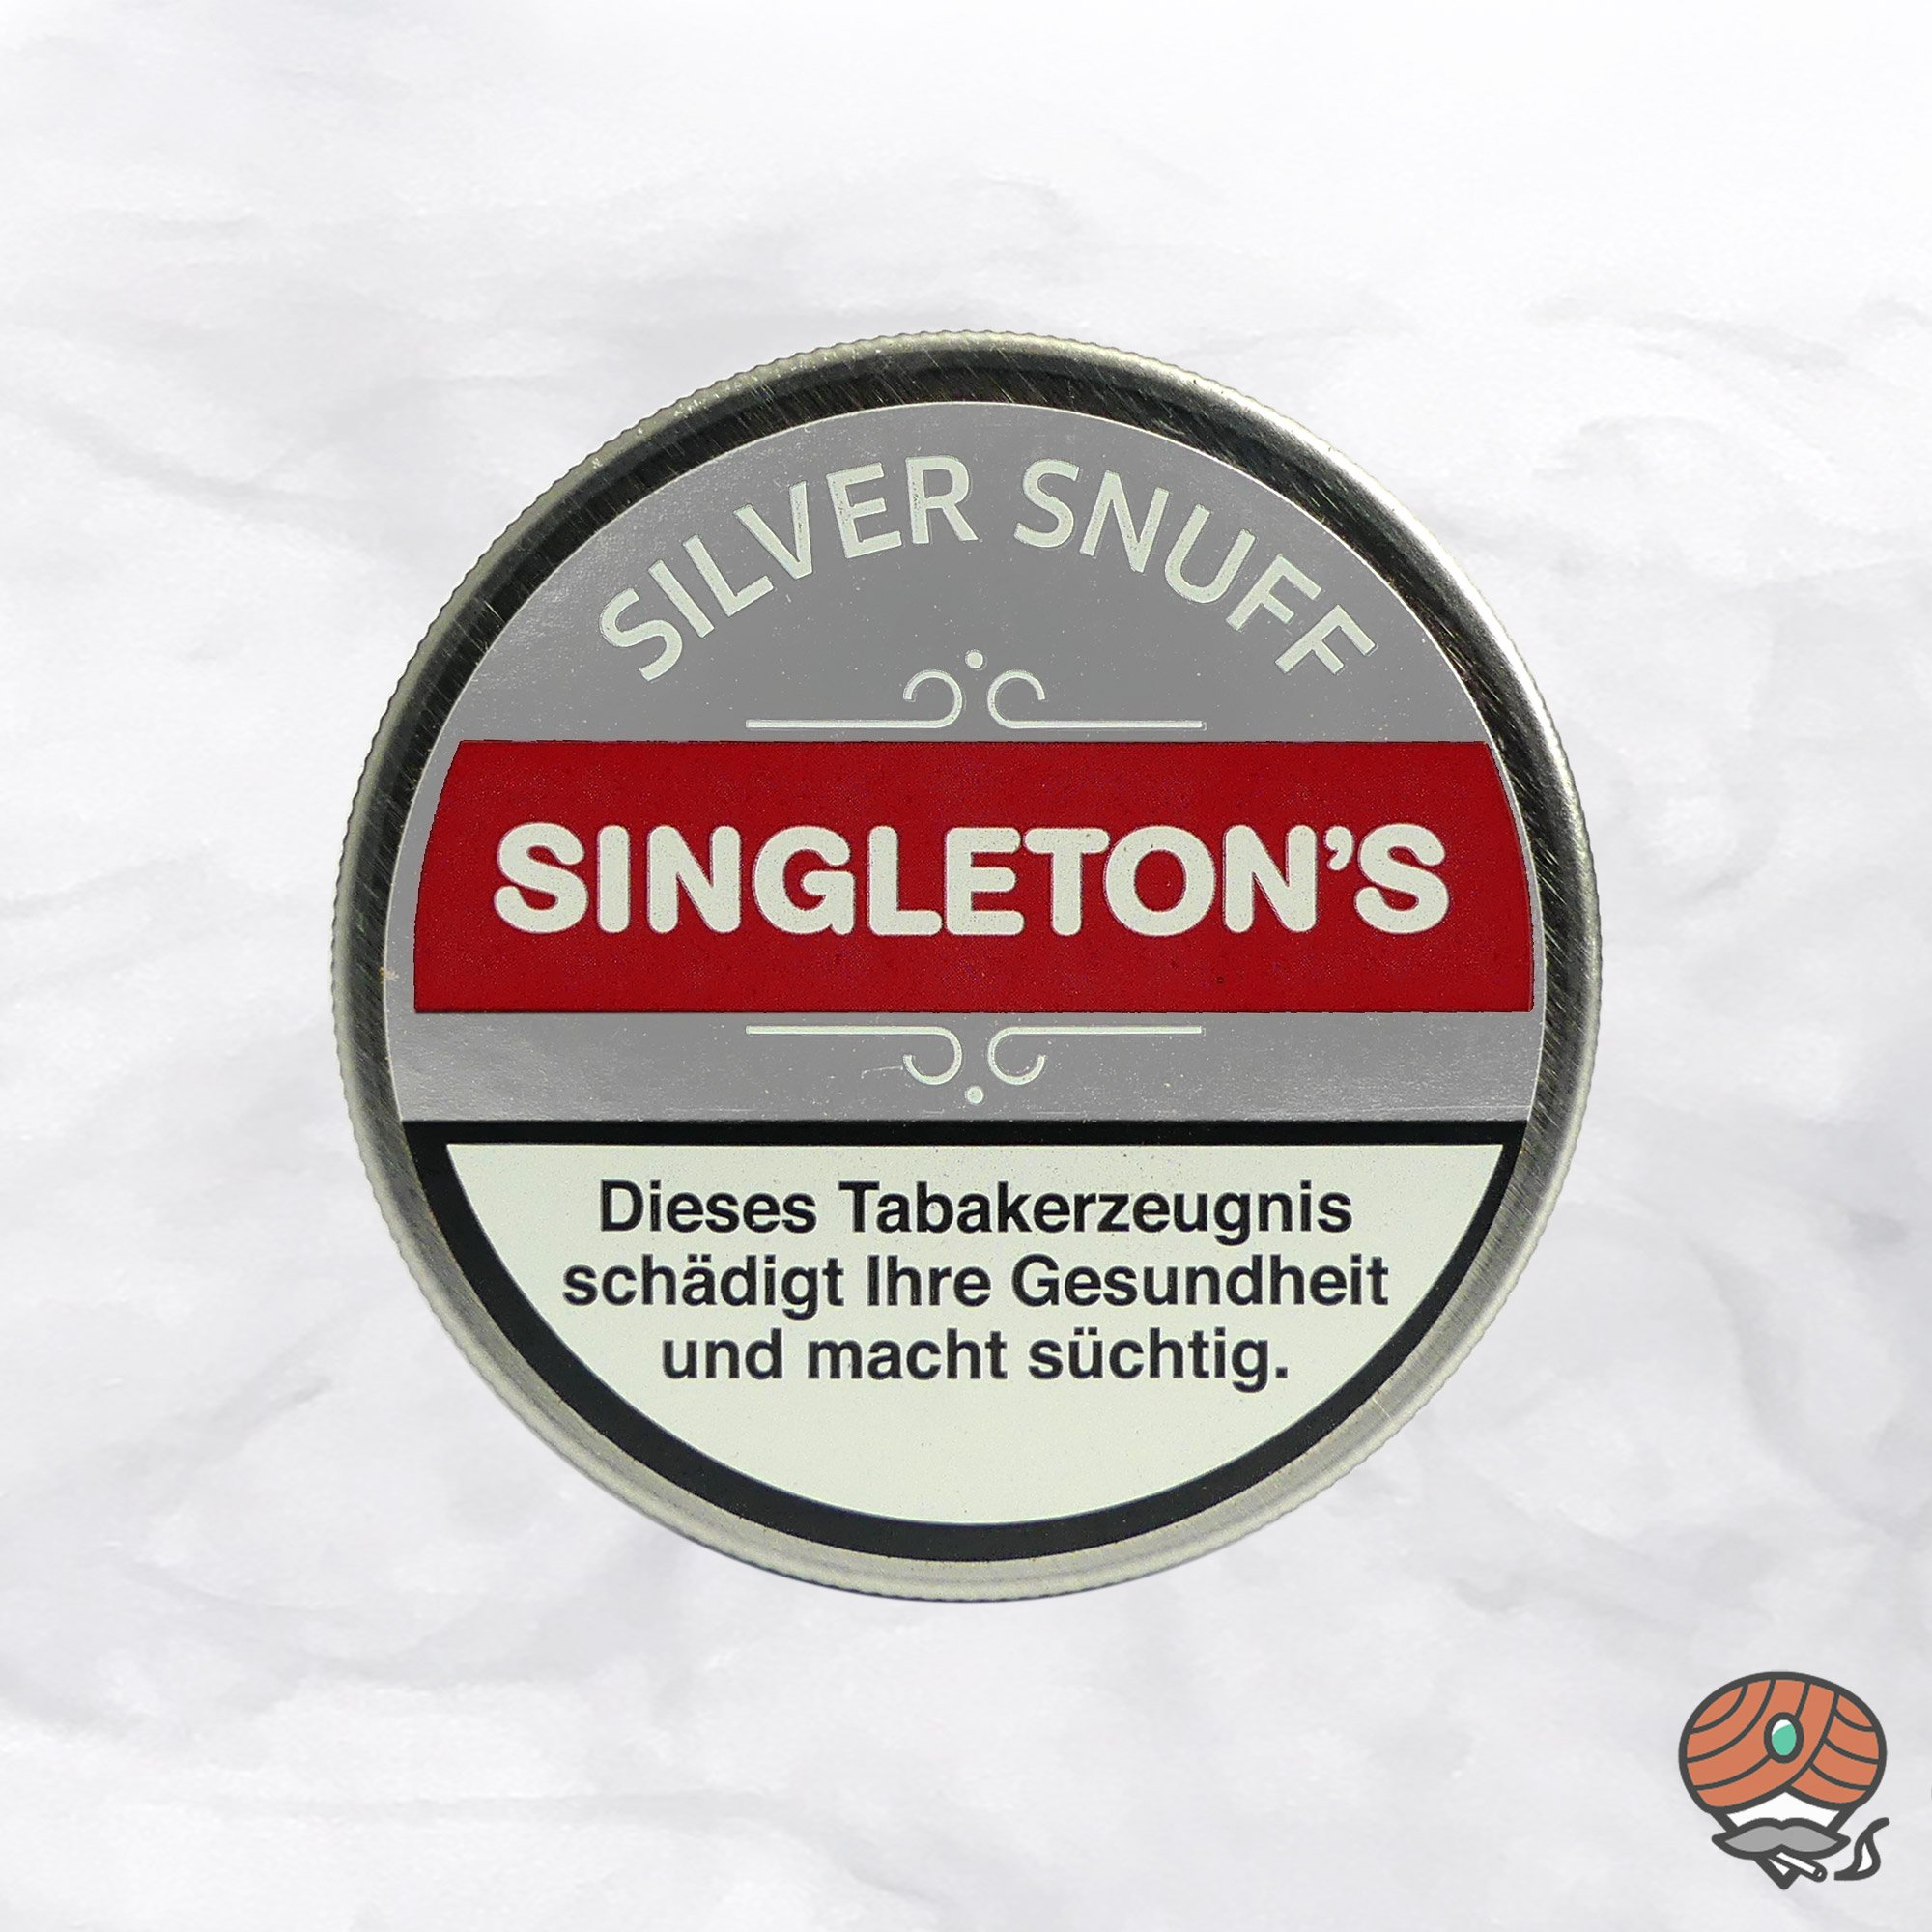 SINGLETON´S Silver Snuff Schnupftabak 6g Dose